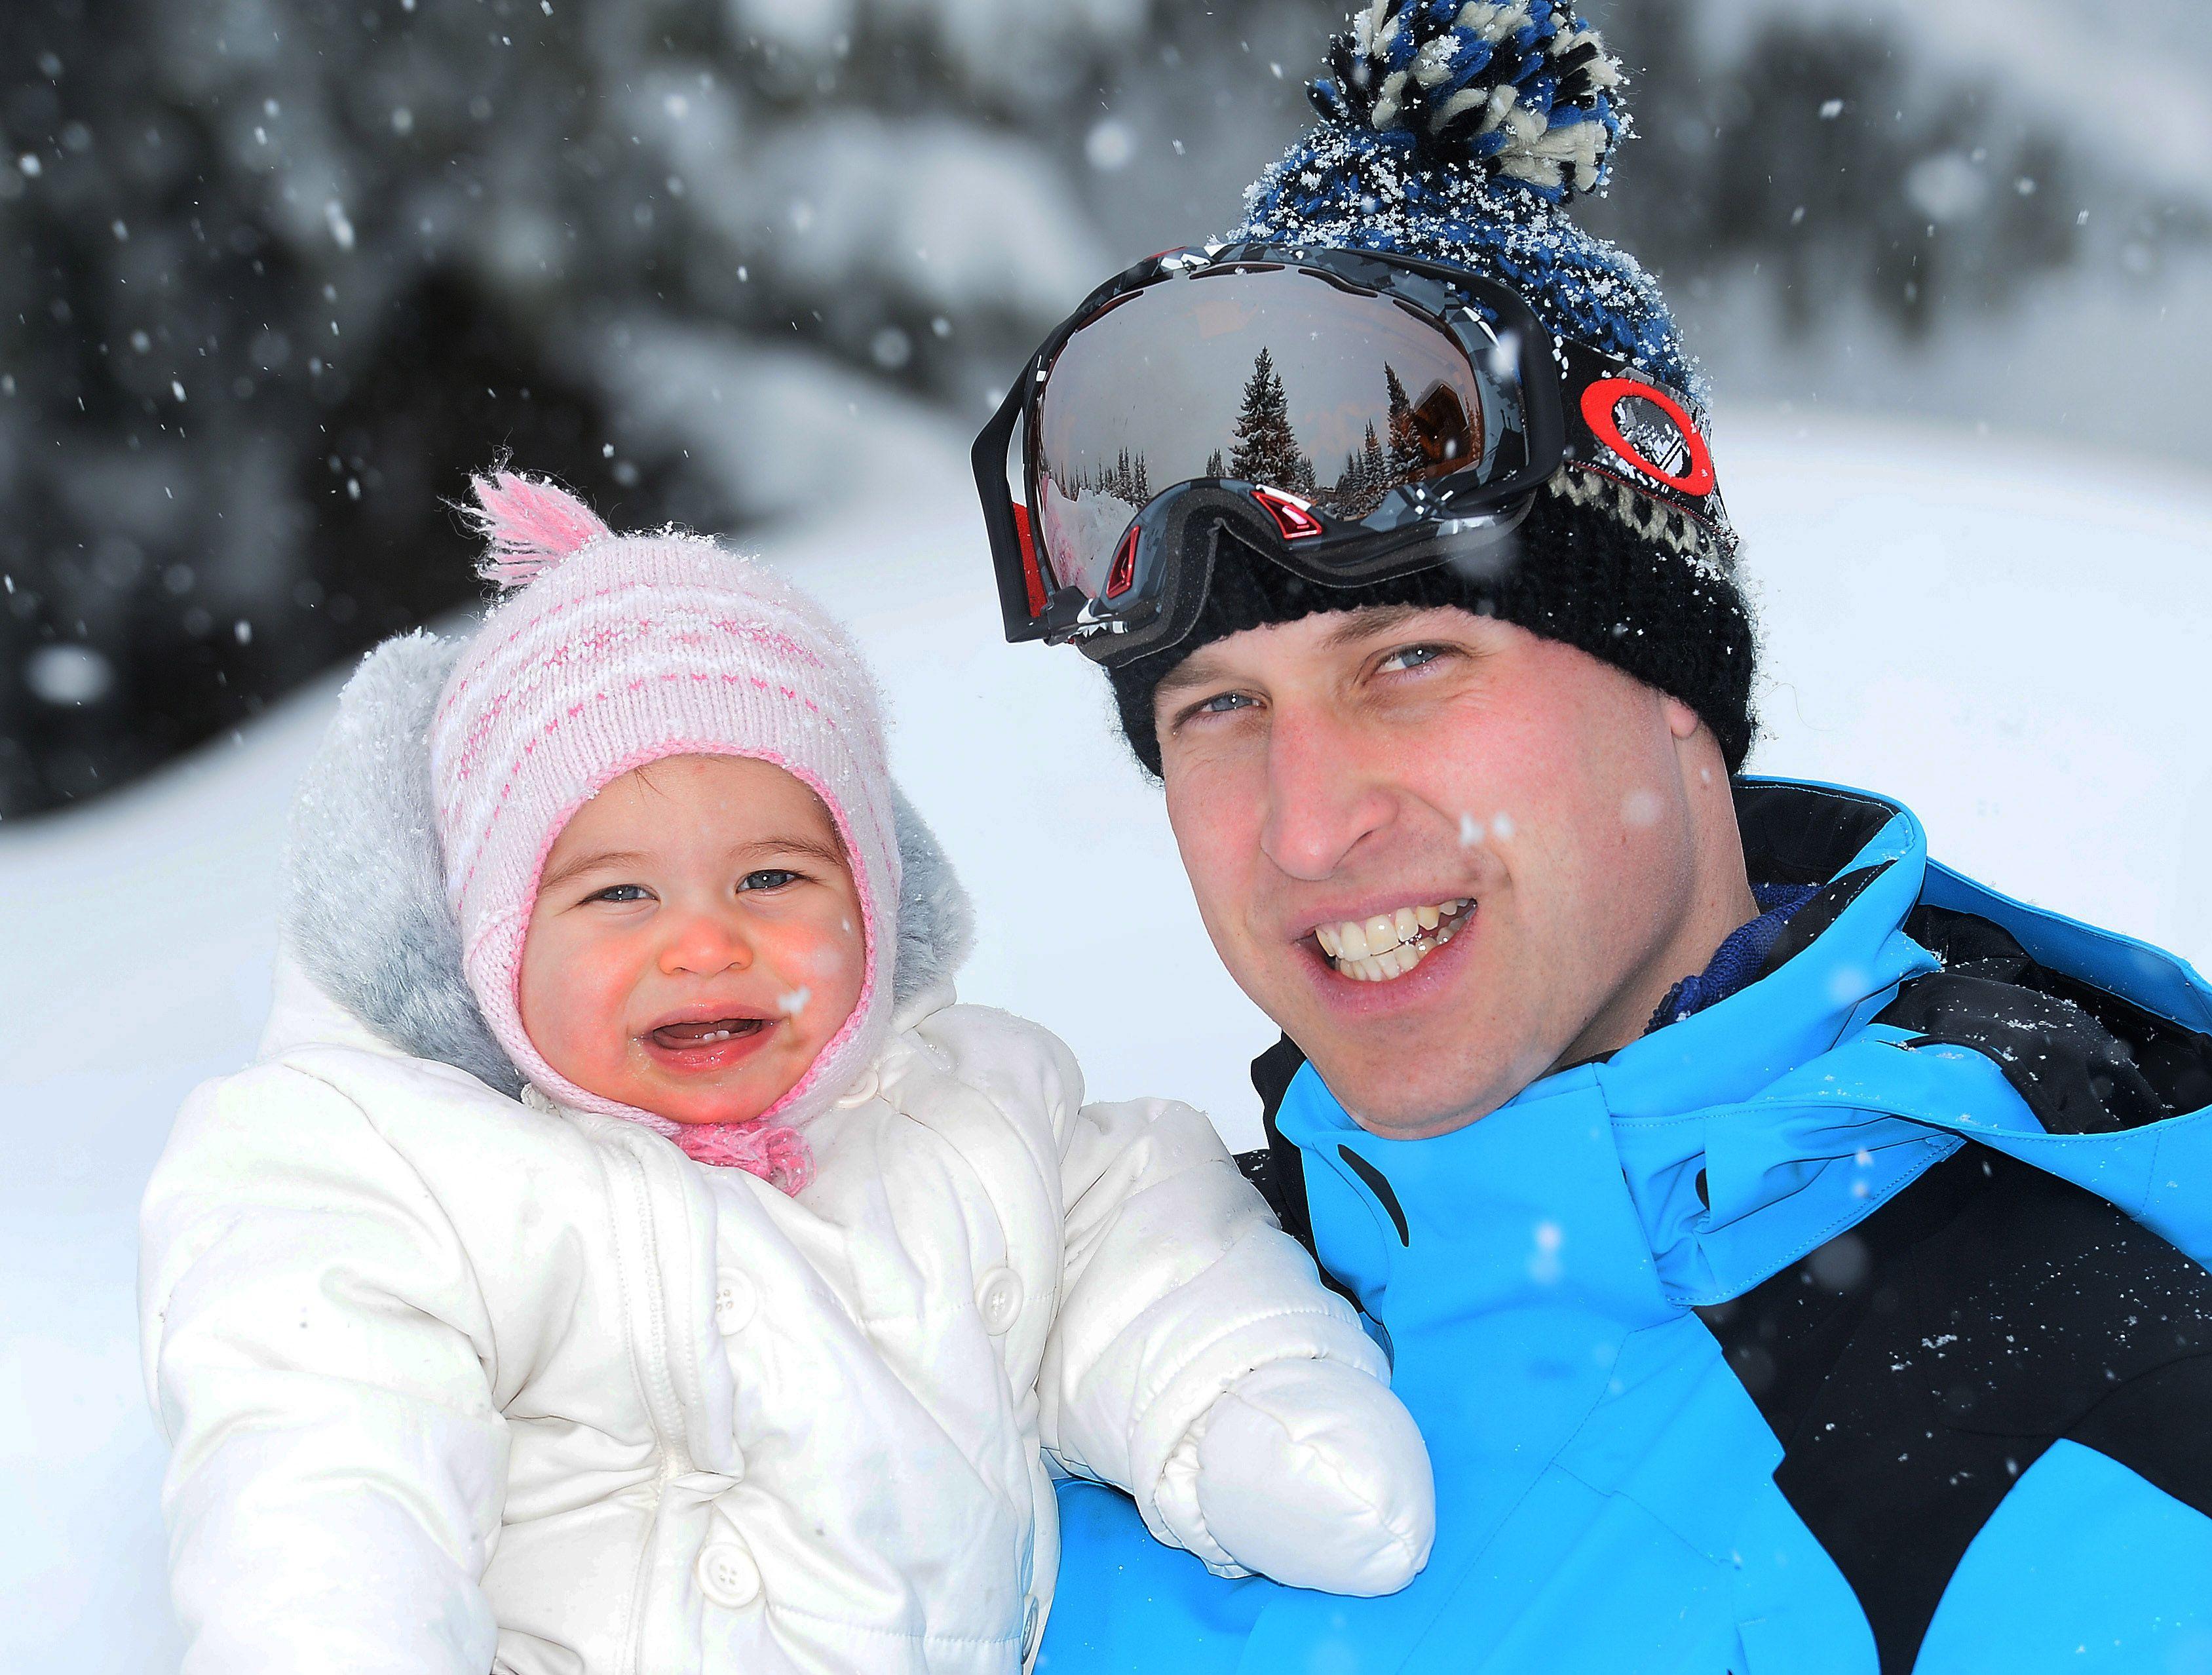 The Duke and Duchess of Cambridge Enjoy Skiing Holiday